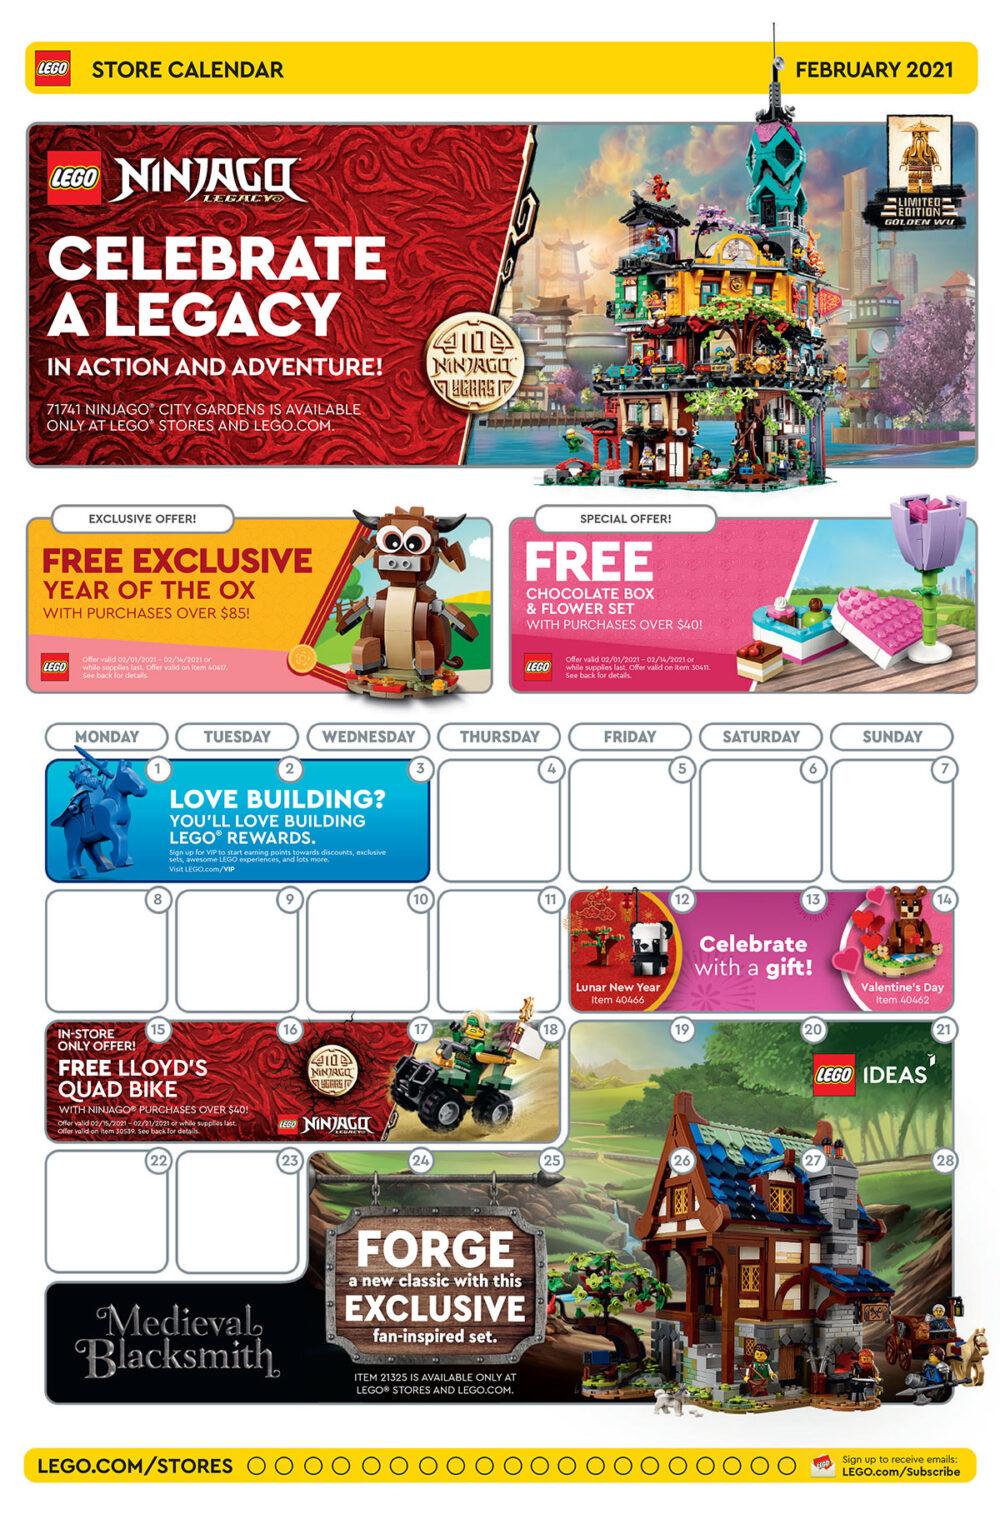 LEGO Store Aktionen in den USA: Februar 2021